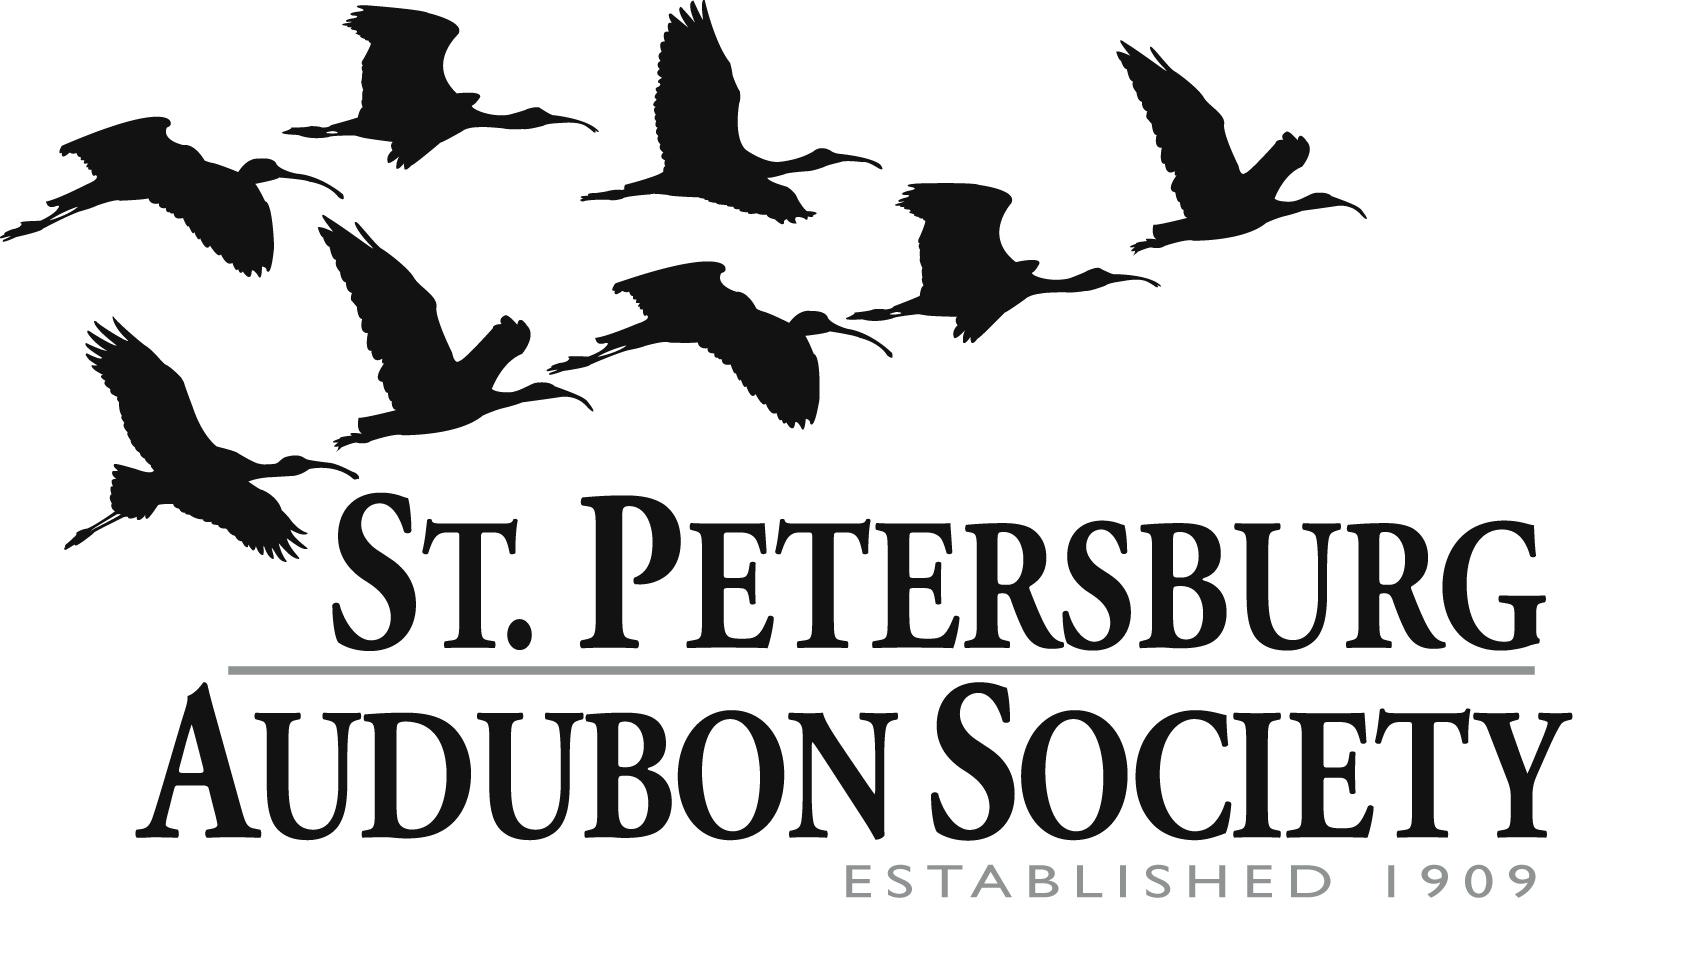 St. Petersburg Audubon Society